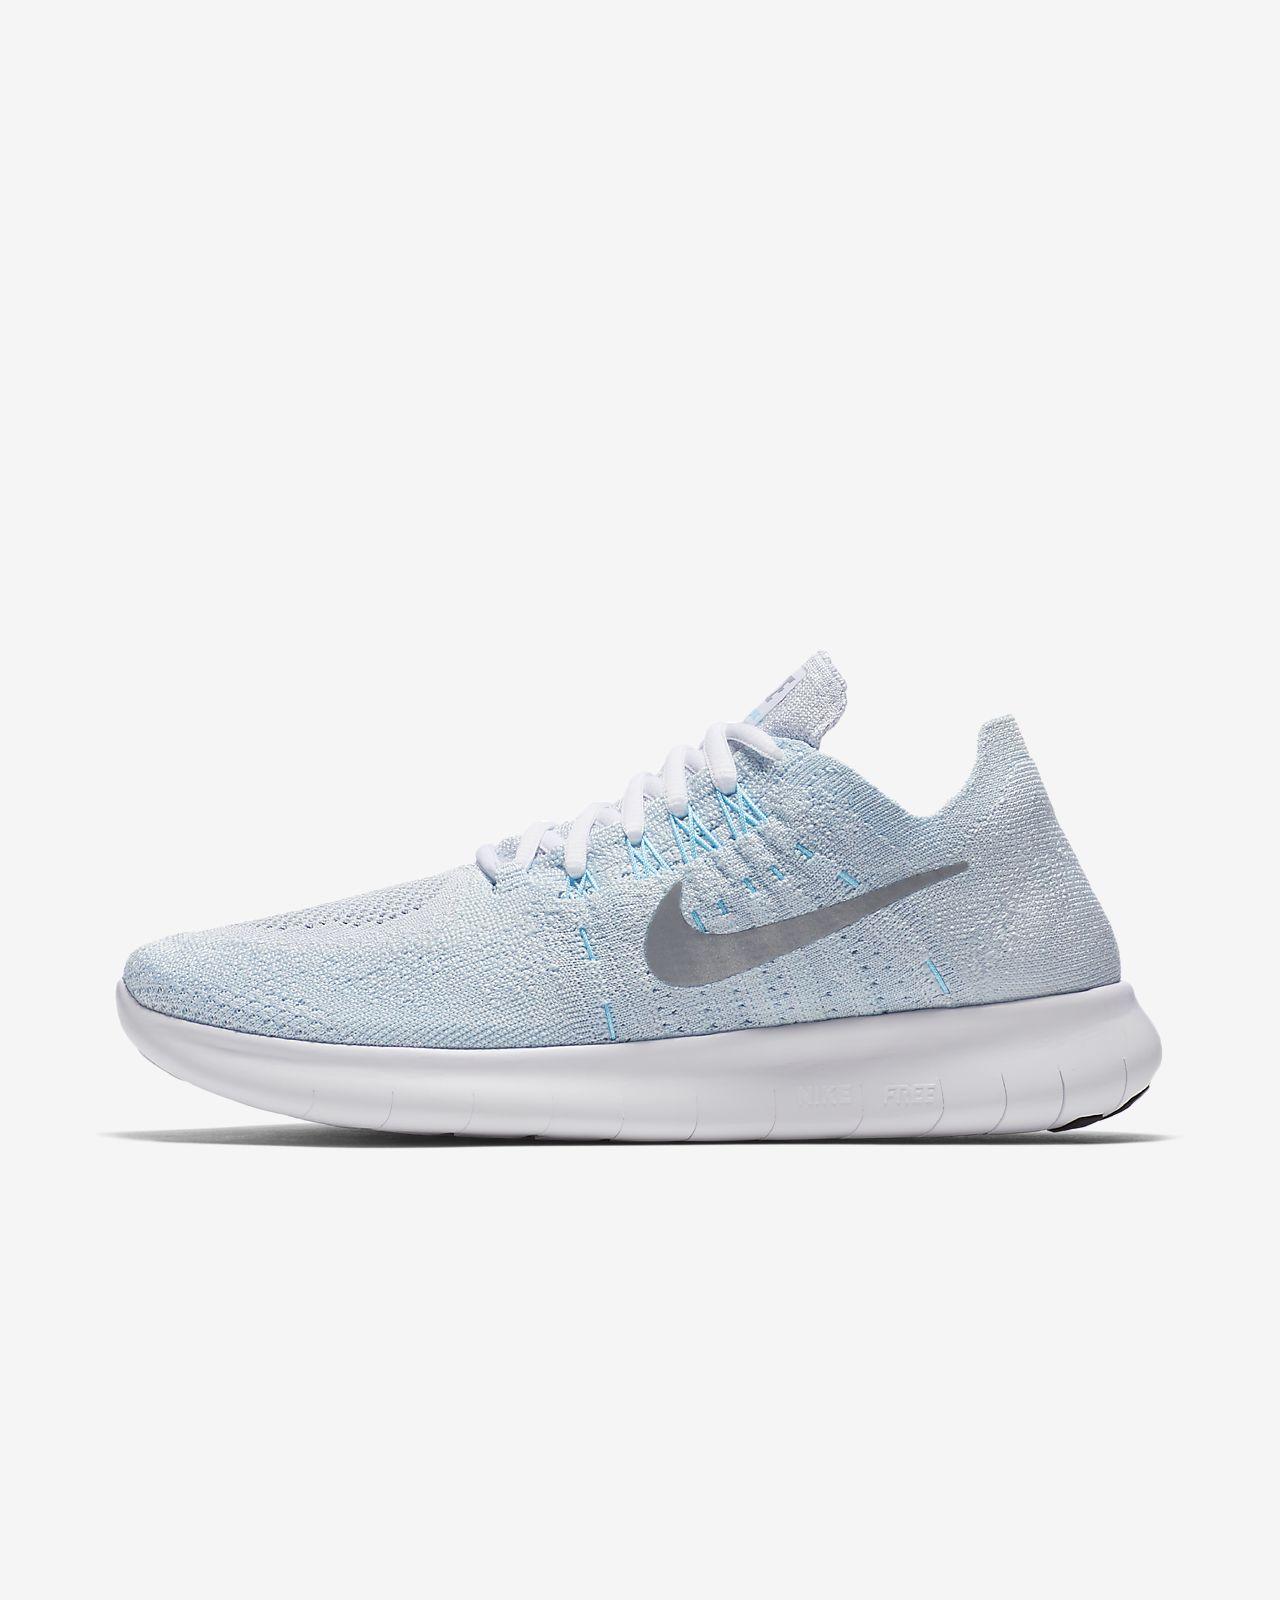 Nike Free RN Flyknit 2017 Womens Running Shoe